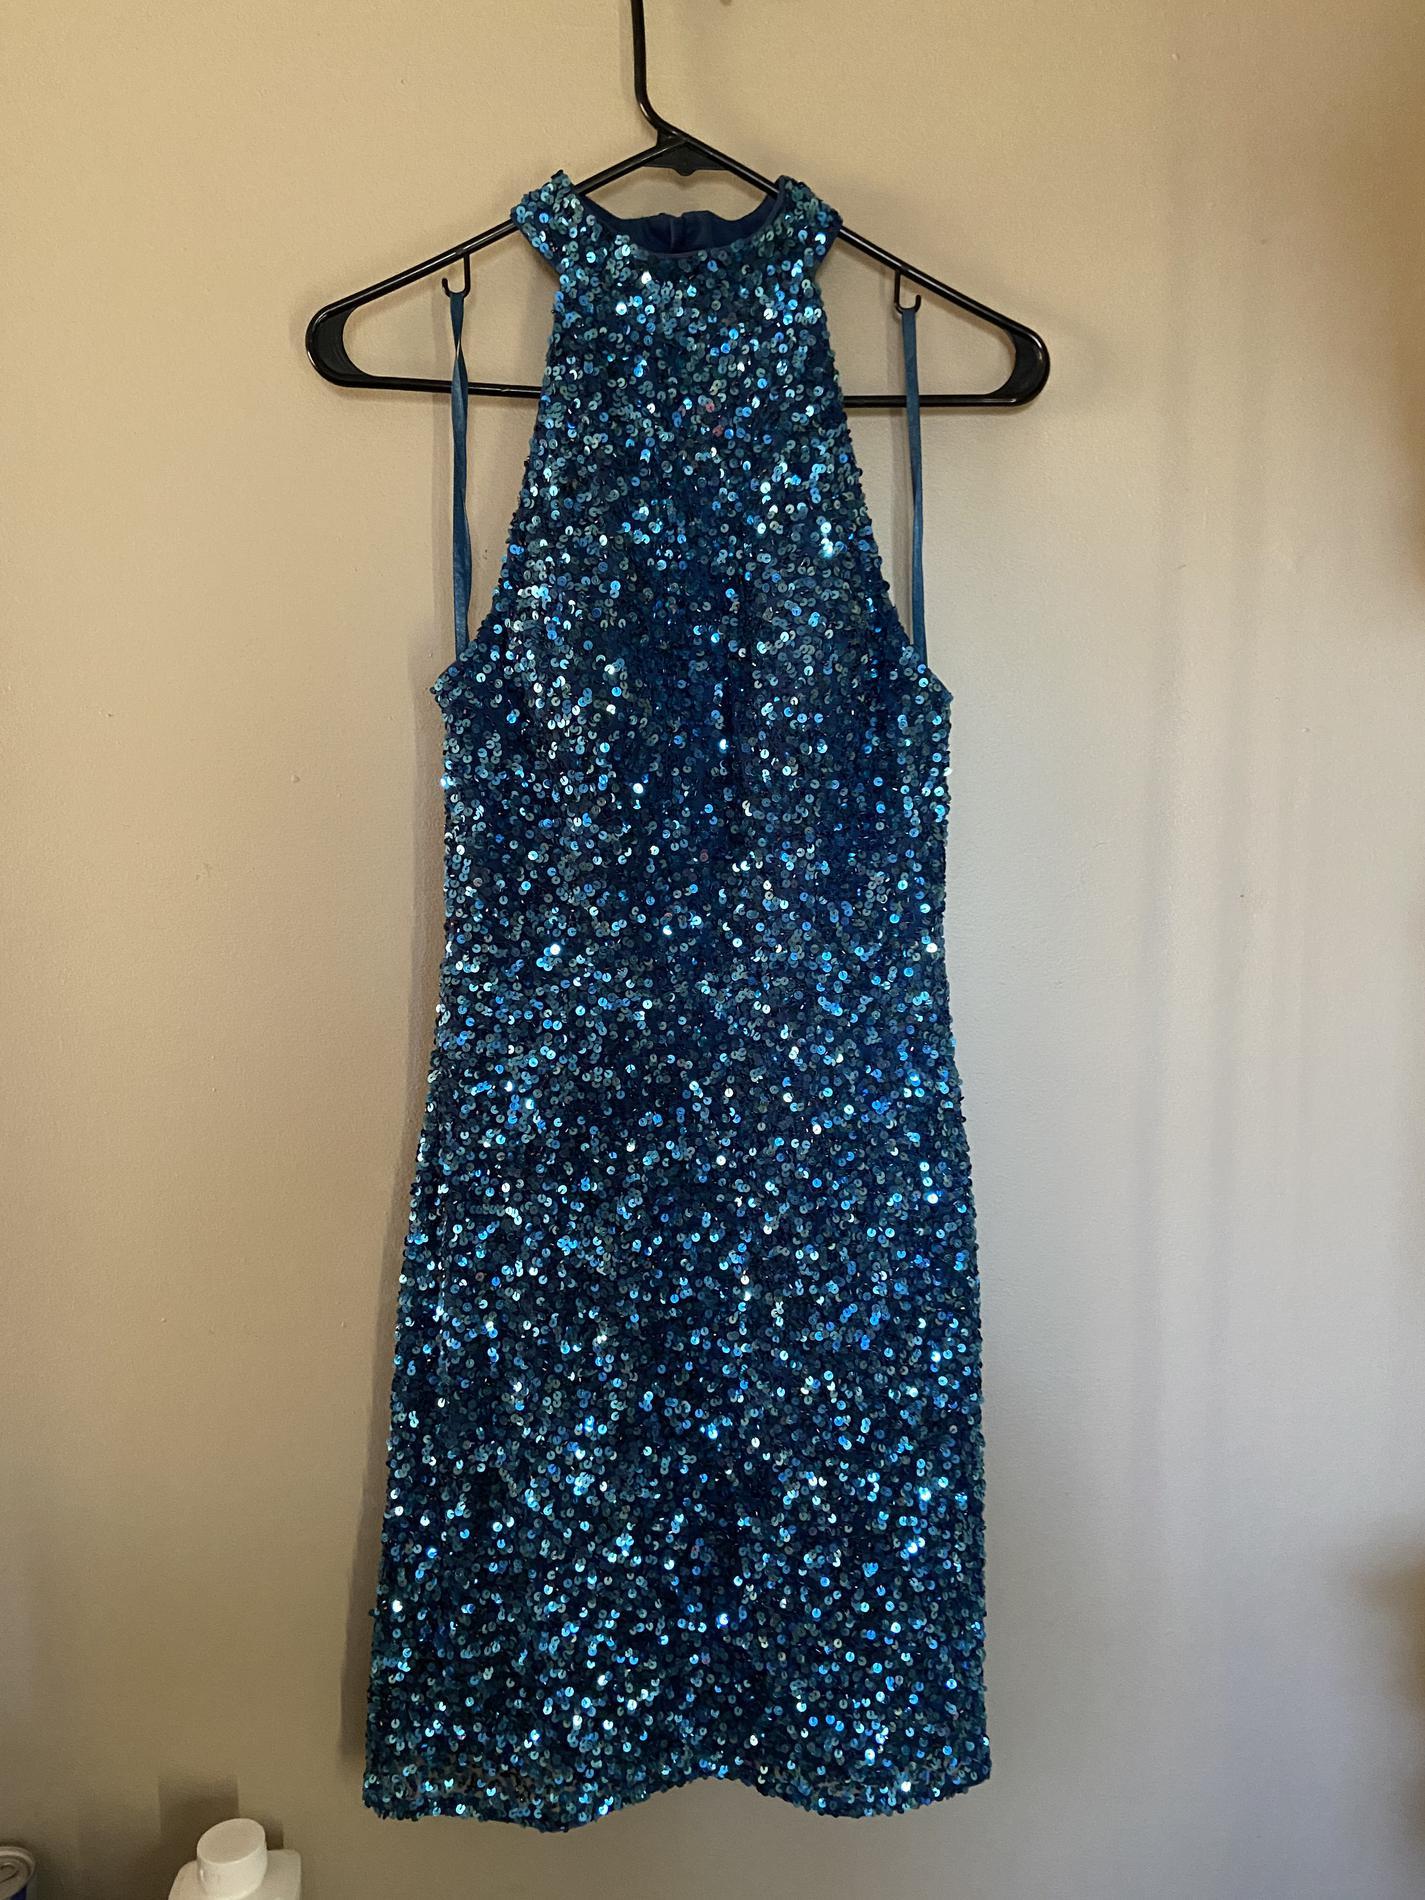 Ashley Lauren Blue Size 6 Sorority Formal Cocktail Dress on Queenly